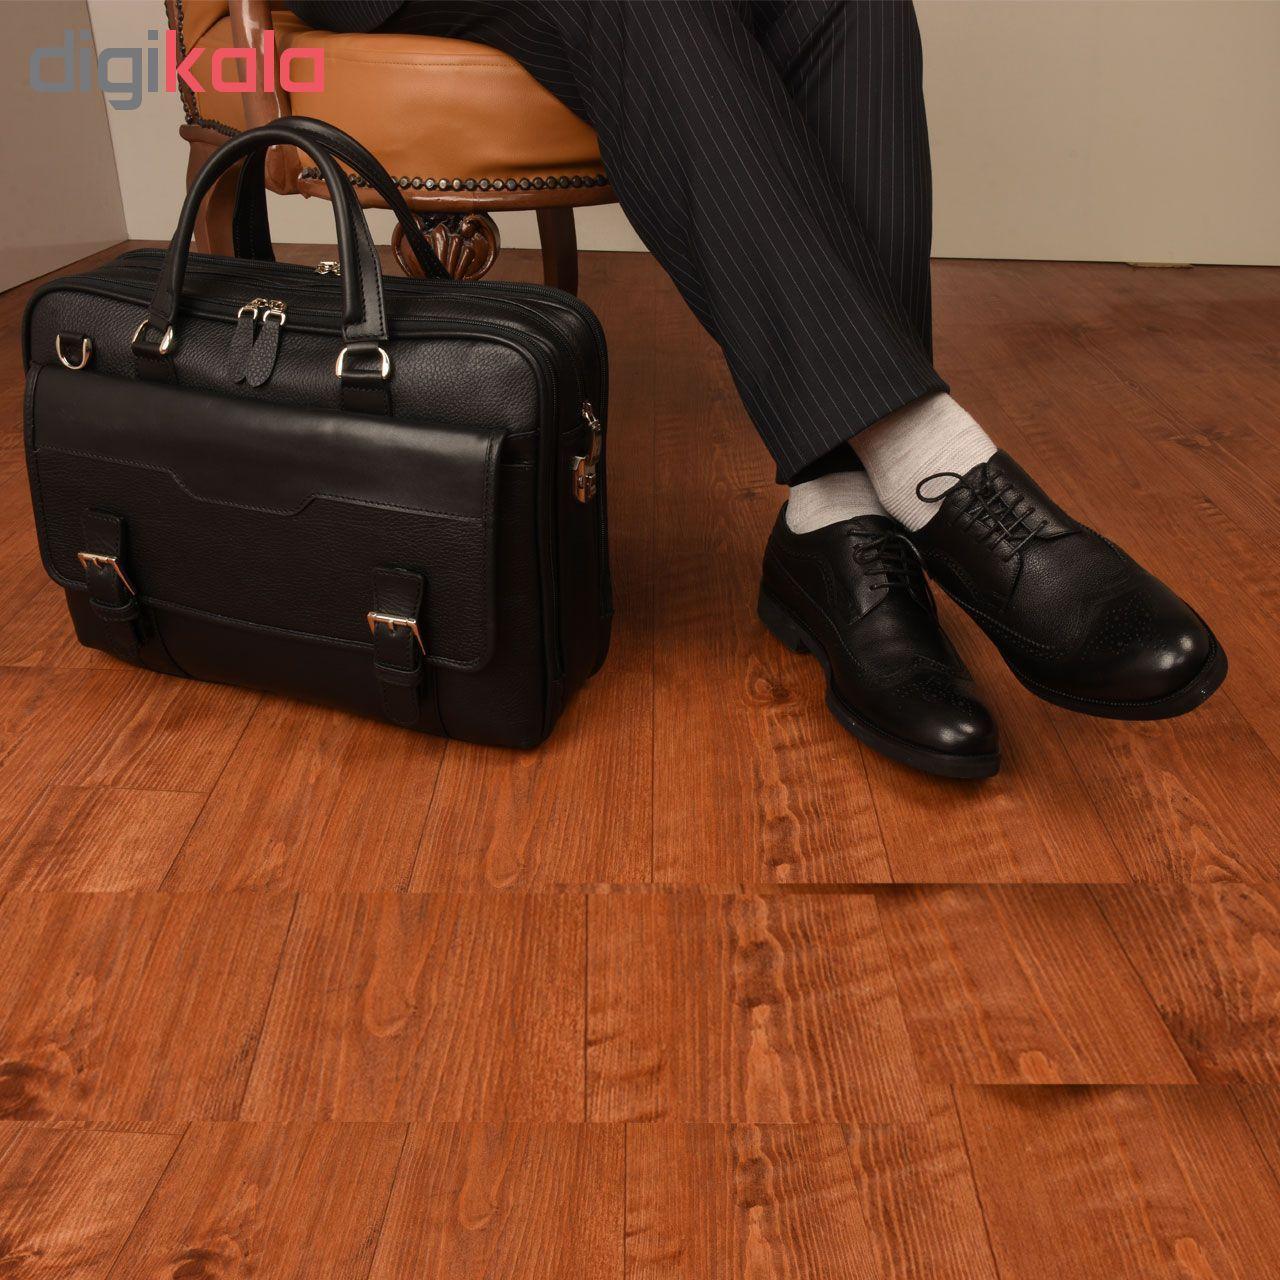 کیف اداری چرم طبیعی کهن چرم مدل L141 main 1 15